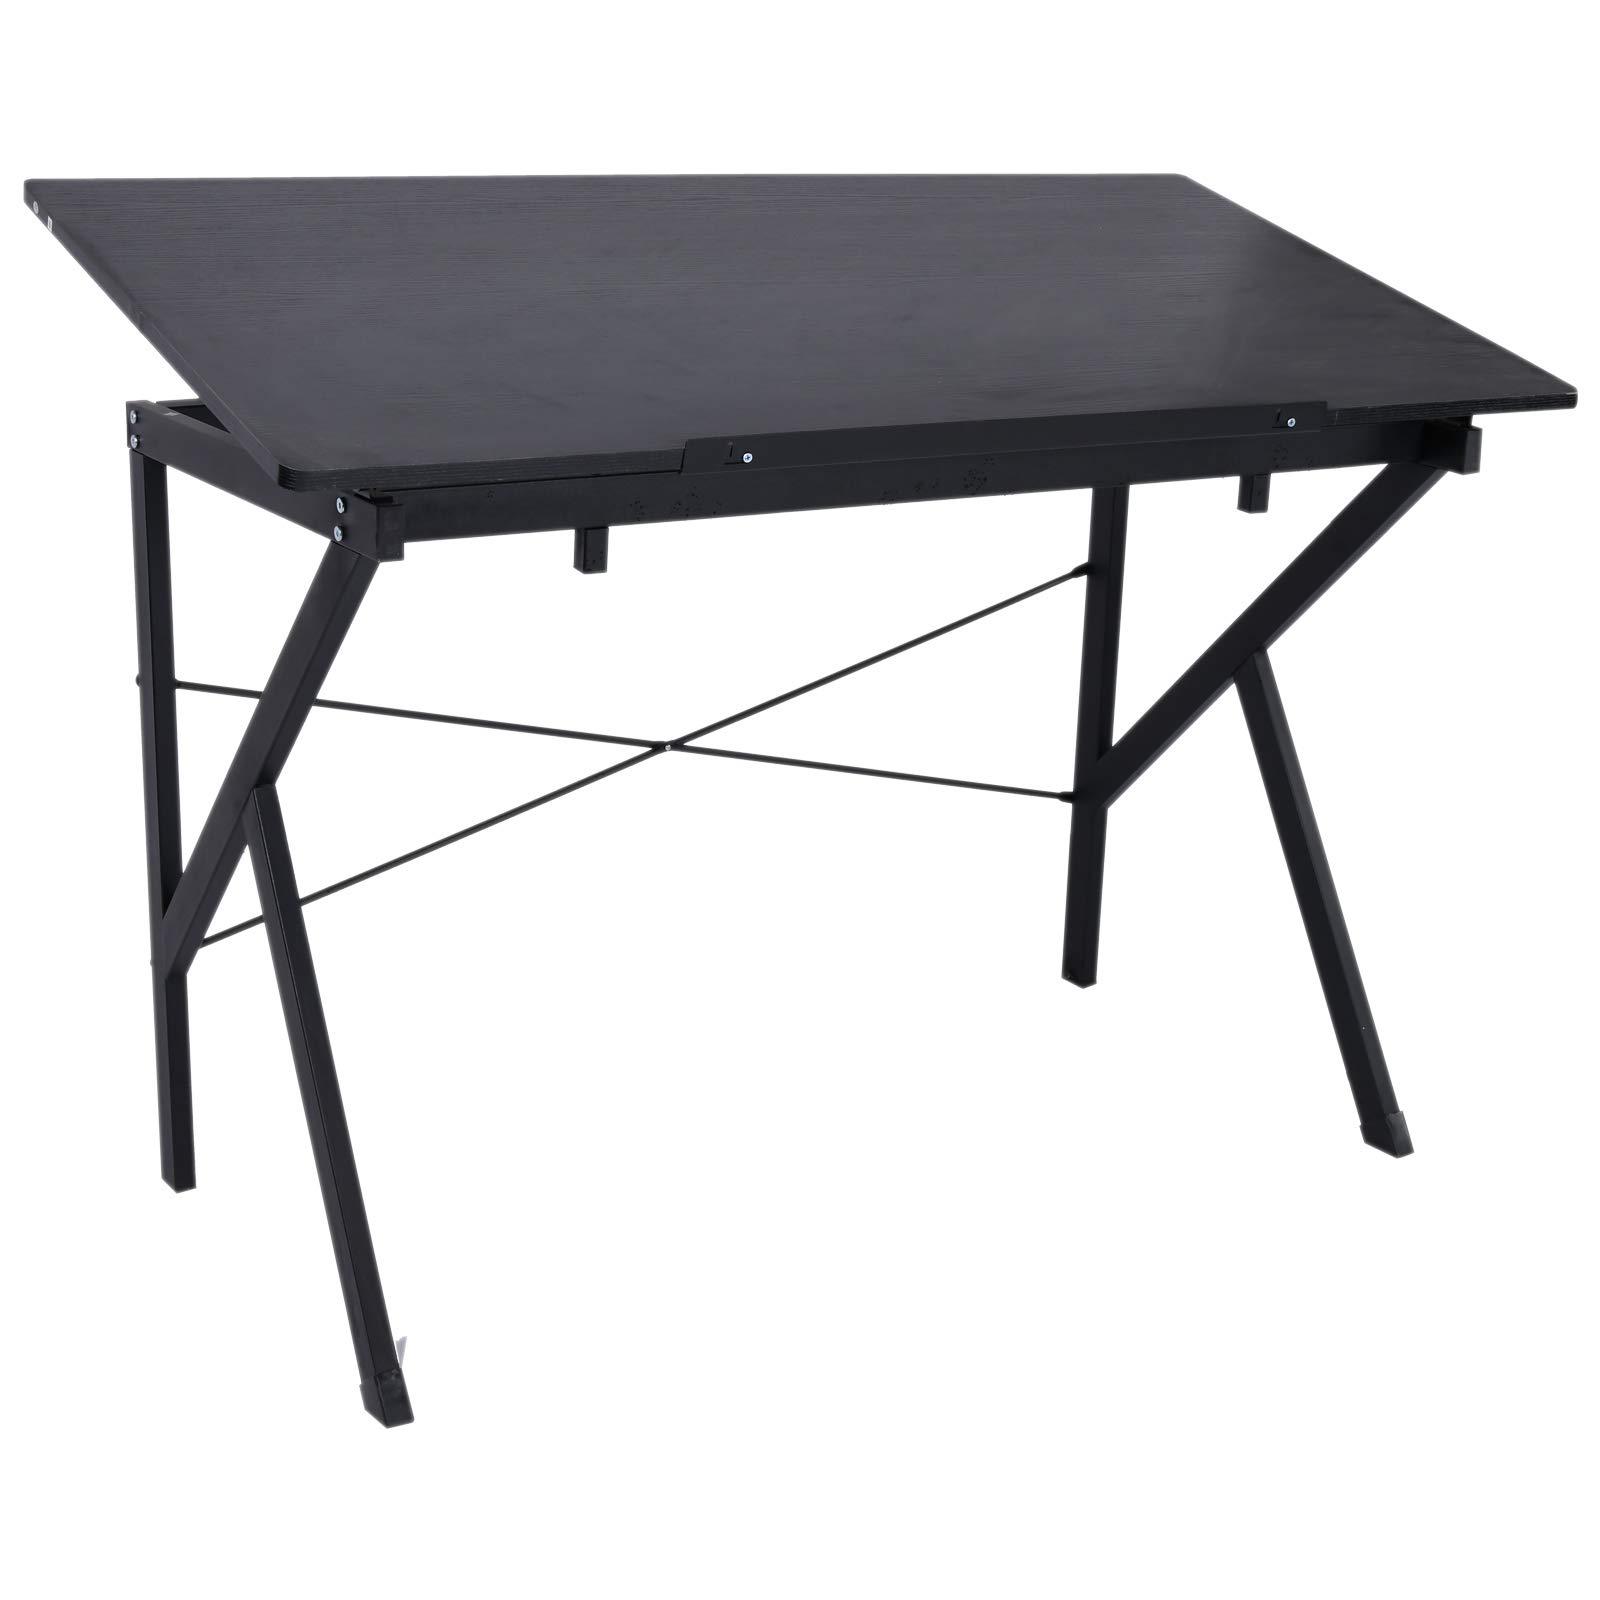 HOMCOM Wood Adjustable Folding Tilt-Top Art Drawing Drafting Table - Black